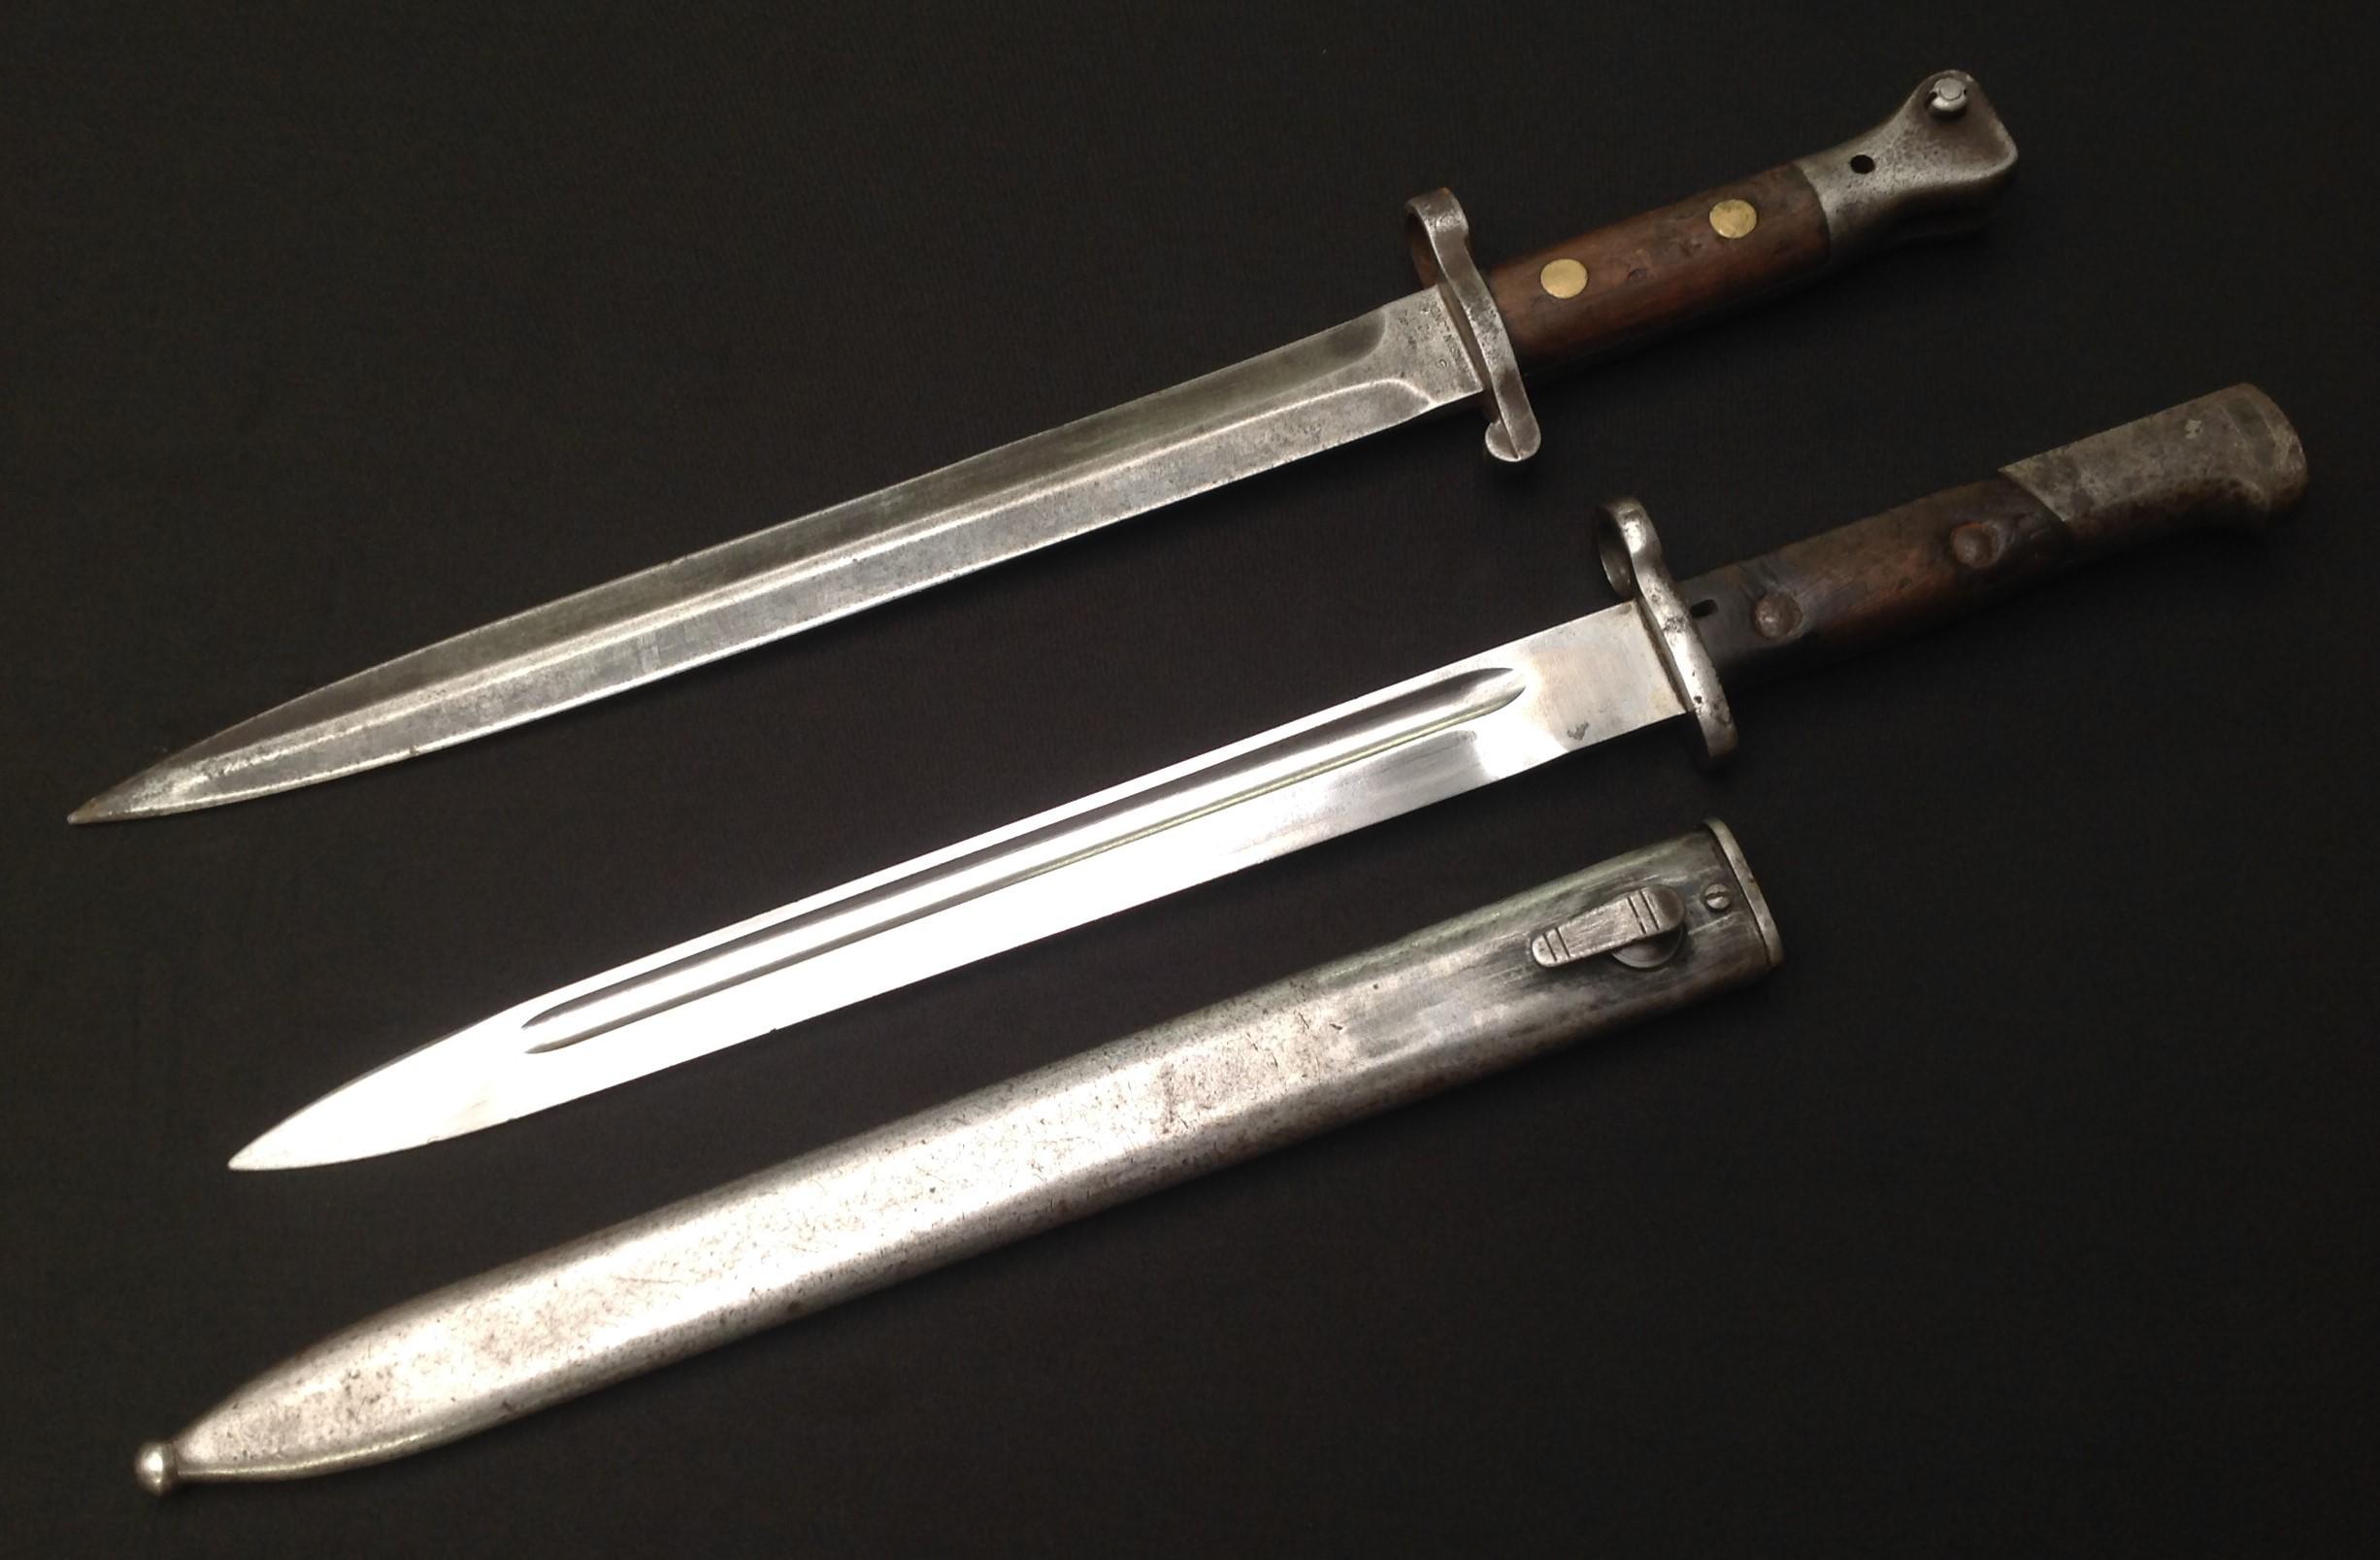 British 1888 pattern Lee-Metford bayonet by Wilkinson, London, 30.5cm blade marked 3 02, two-piece